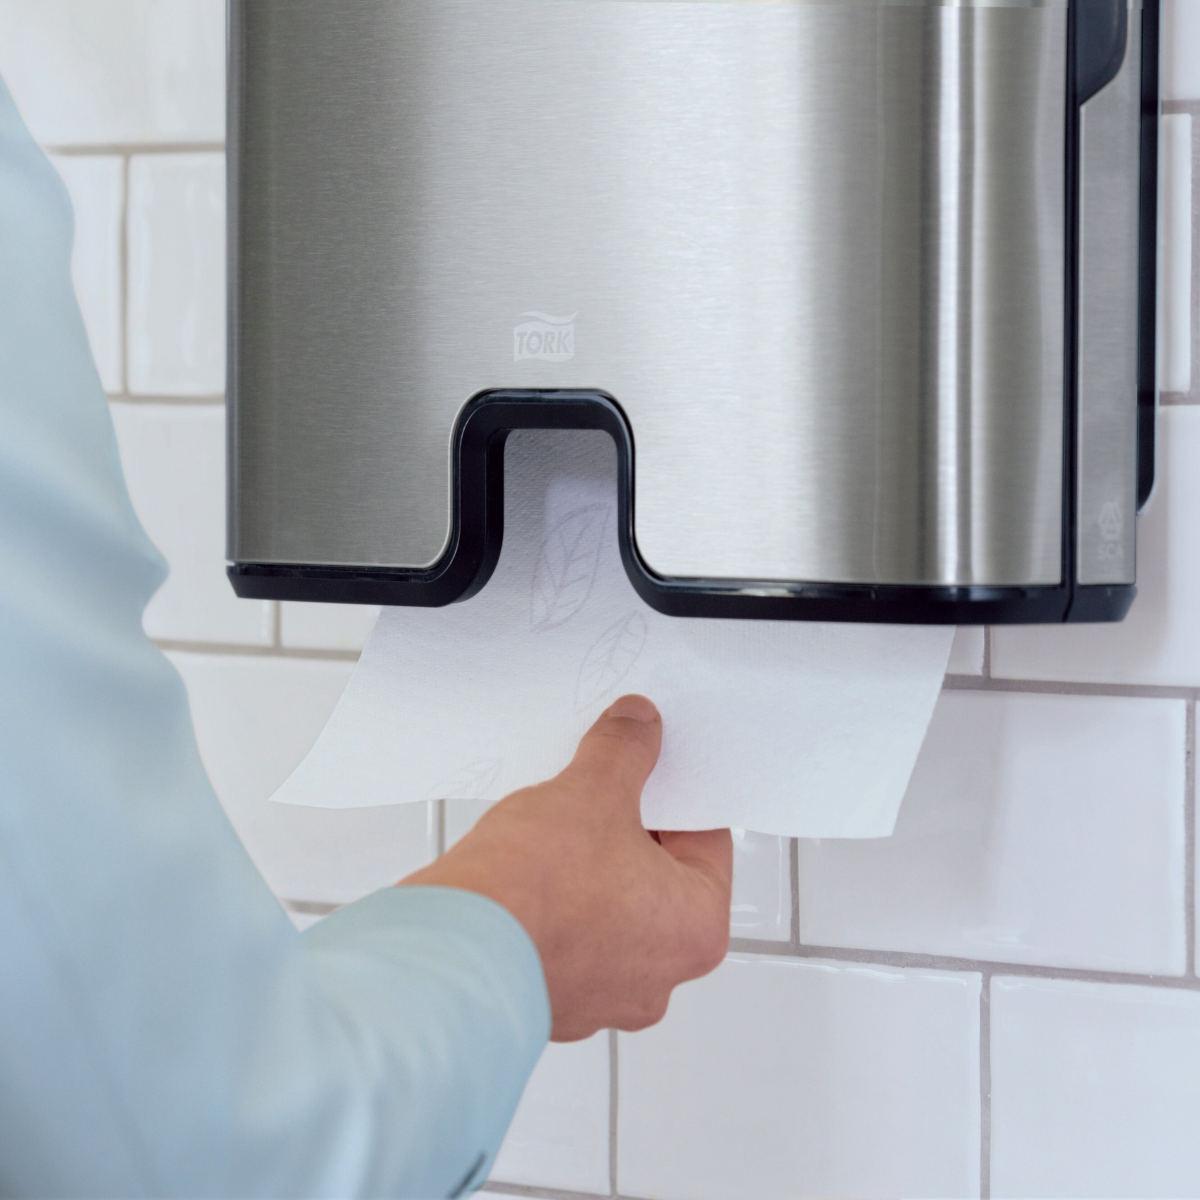 Dispenser Tork inox